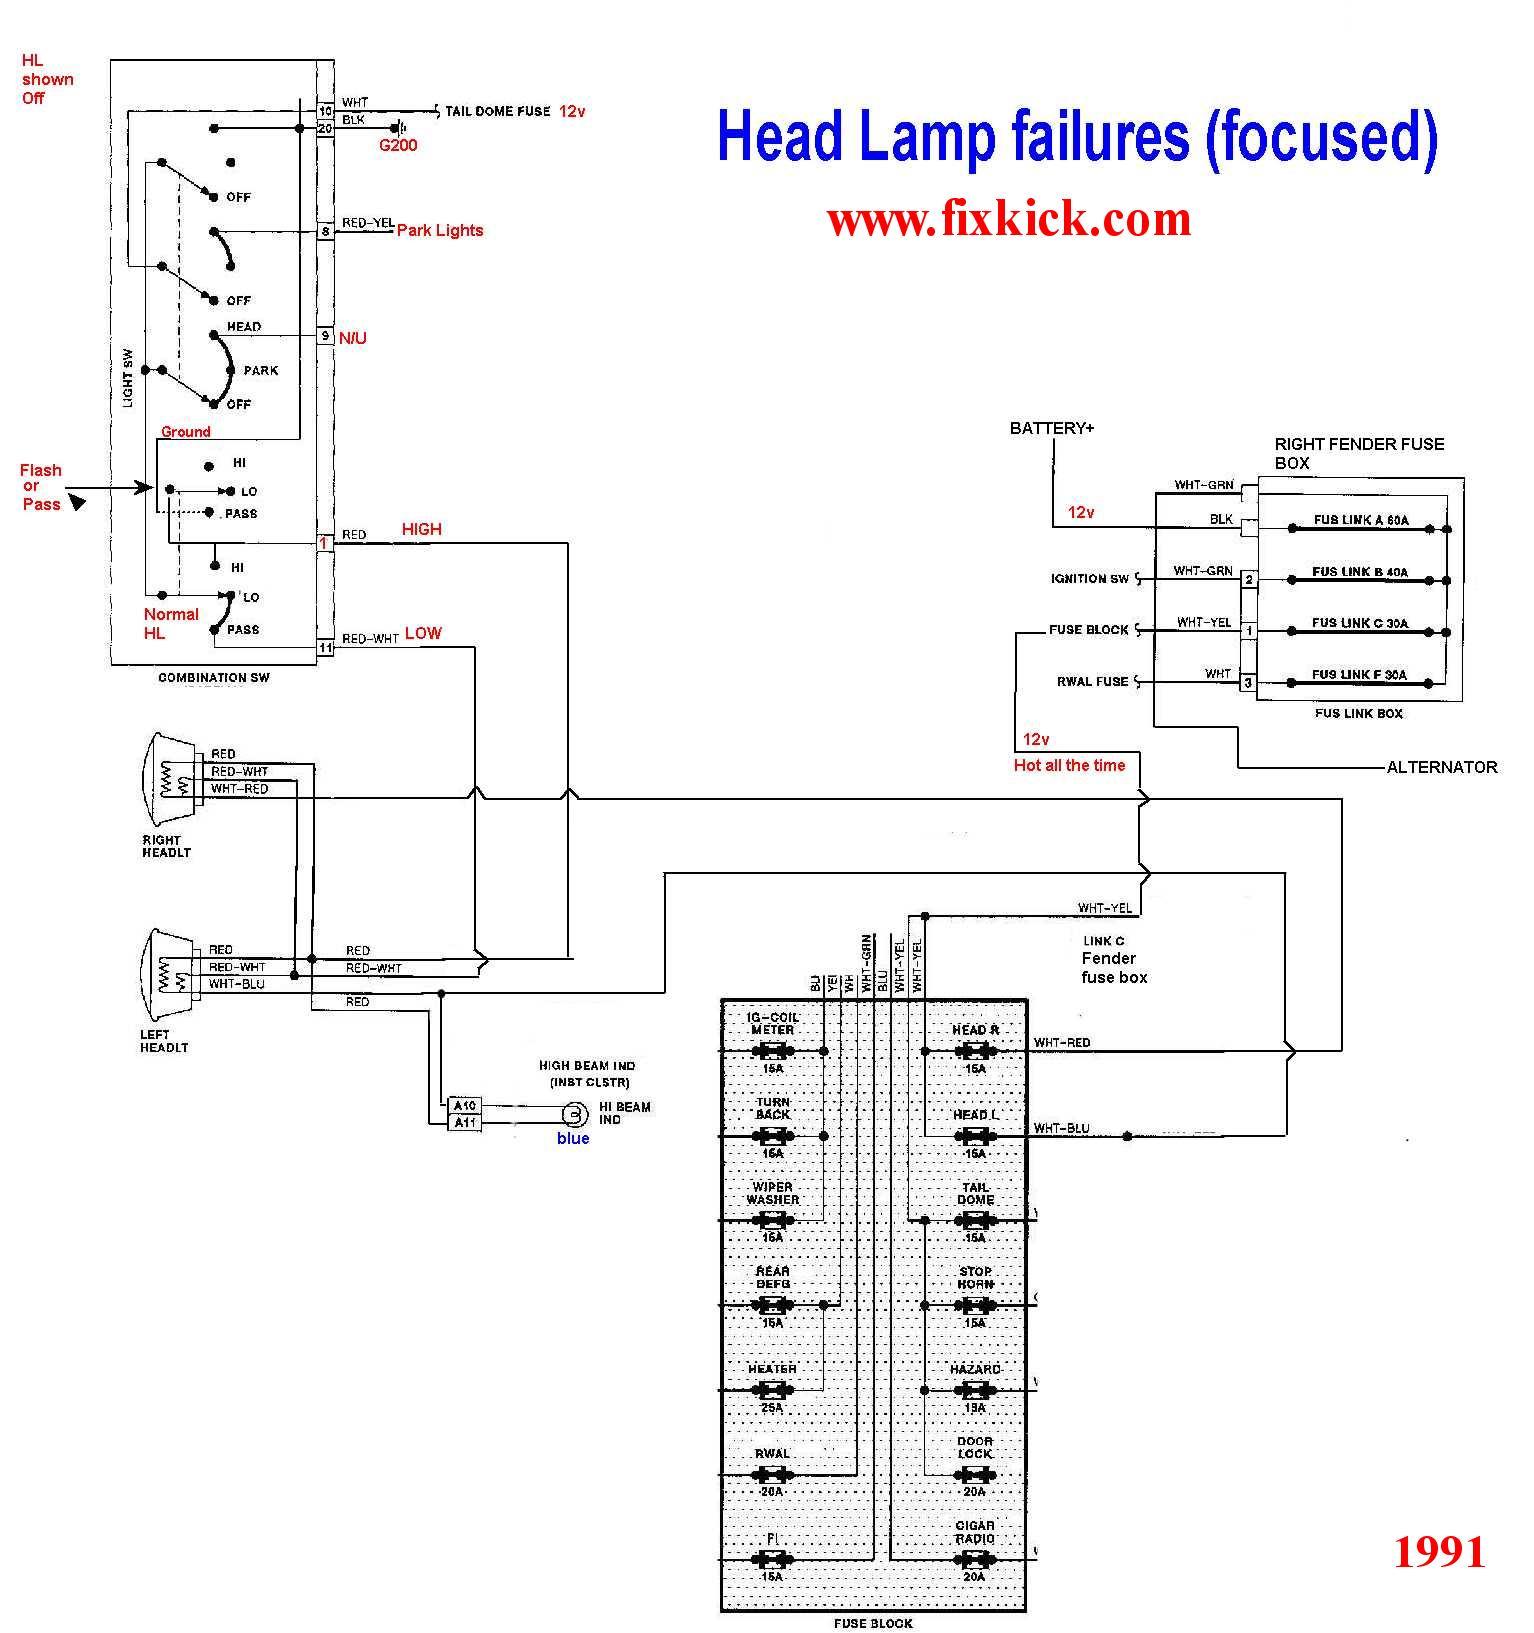 1993 volvo 940 wiring diagram block visio template 2002 q45 fuse box best library